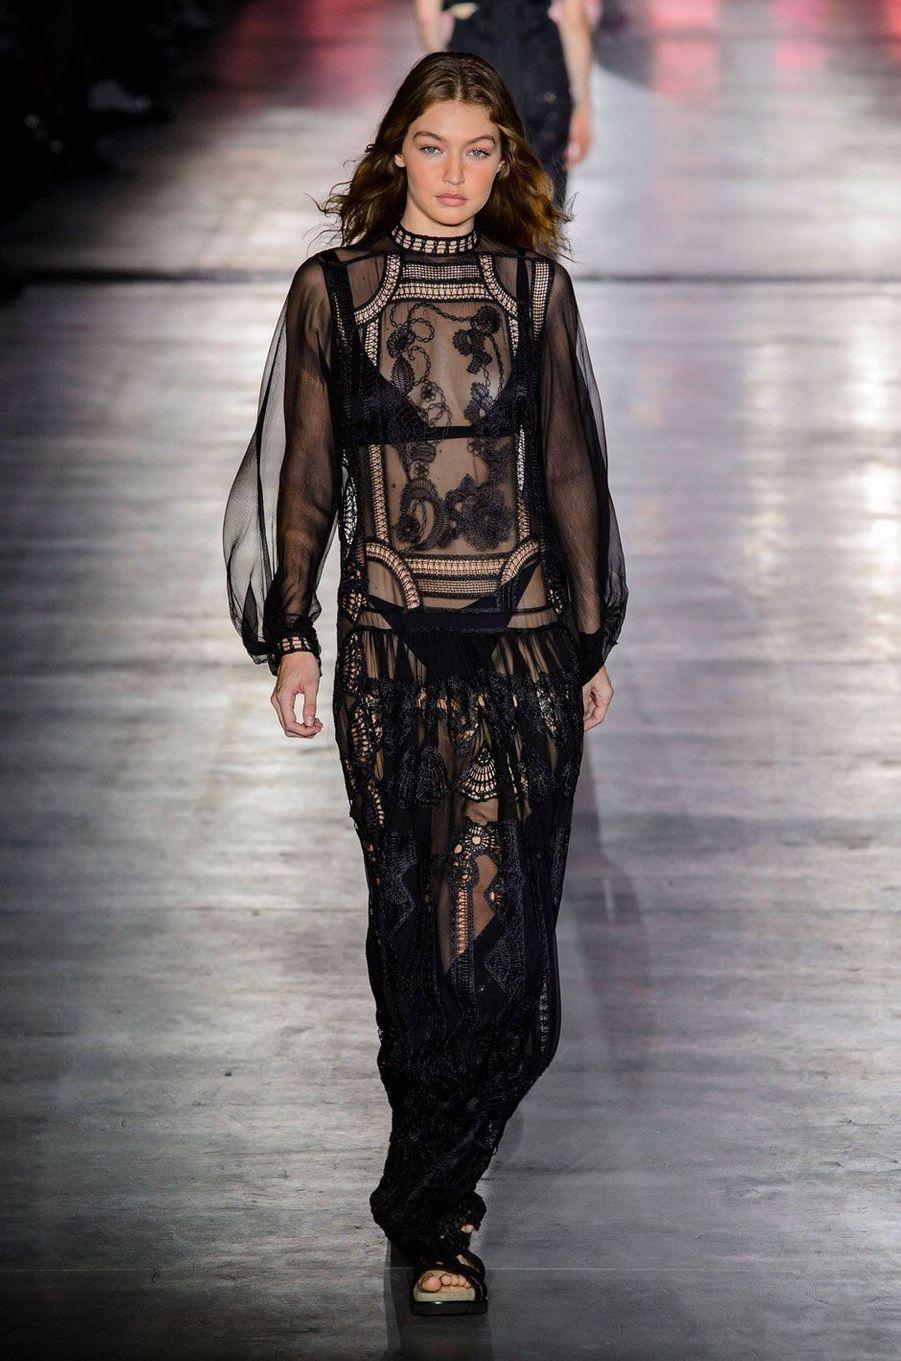 Gigi Hadid défile pour Alberta Ferretti, mercredi 19 septembre 2018 à Milan